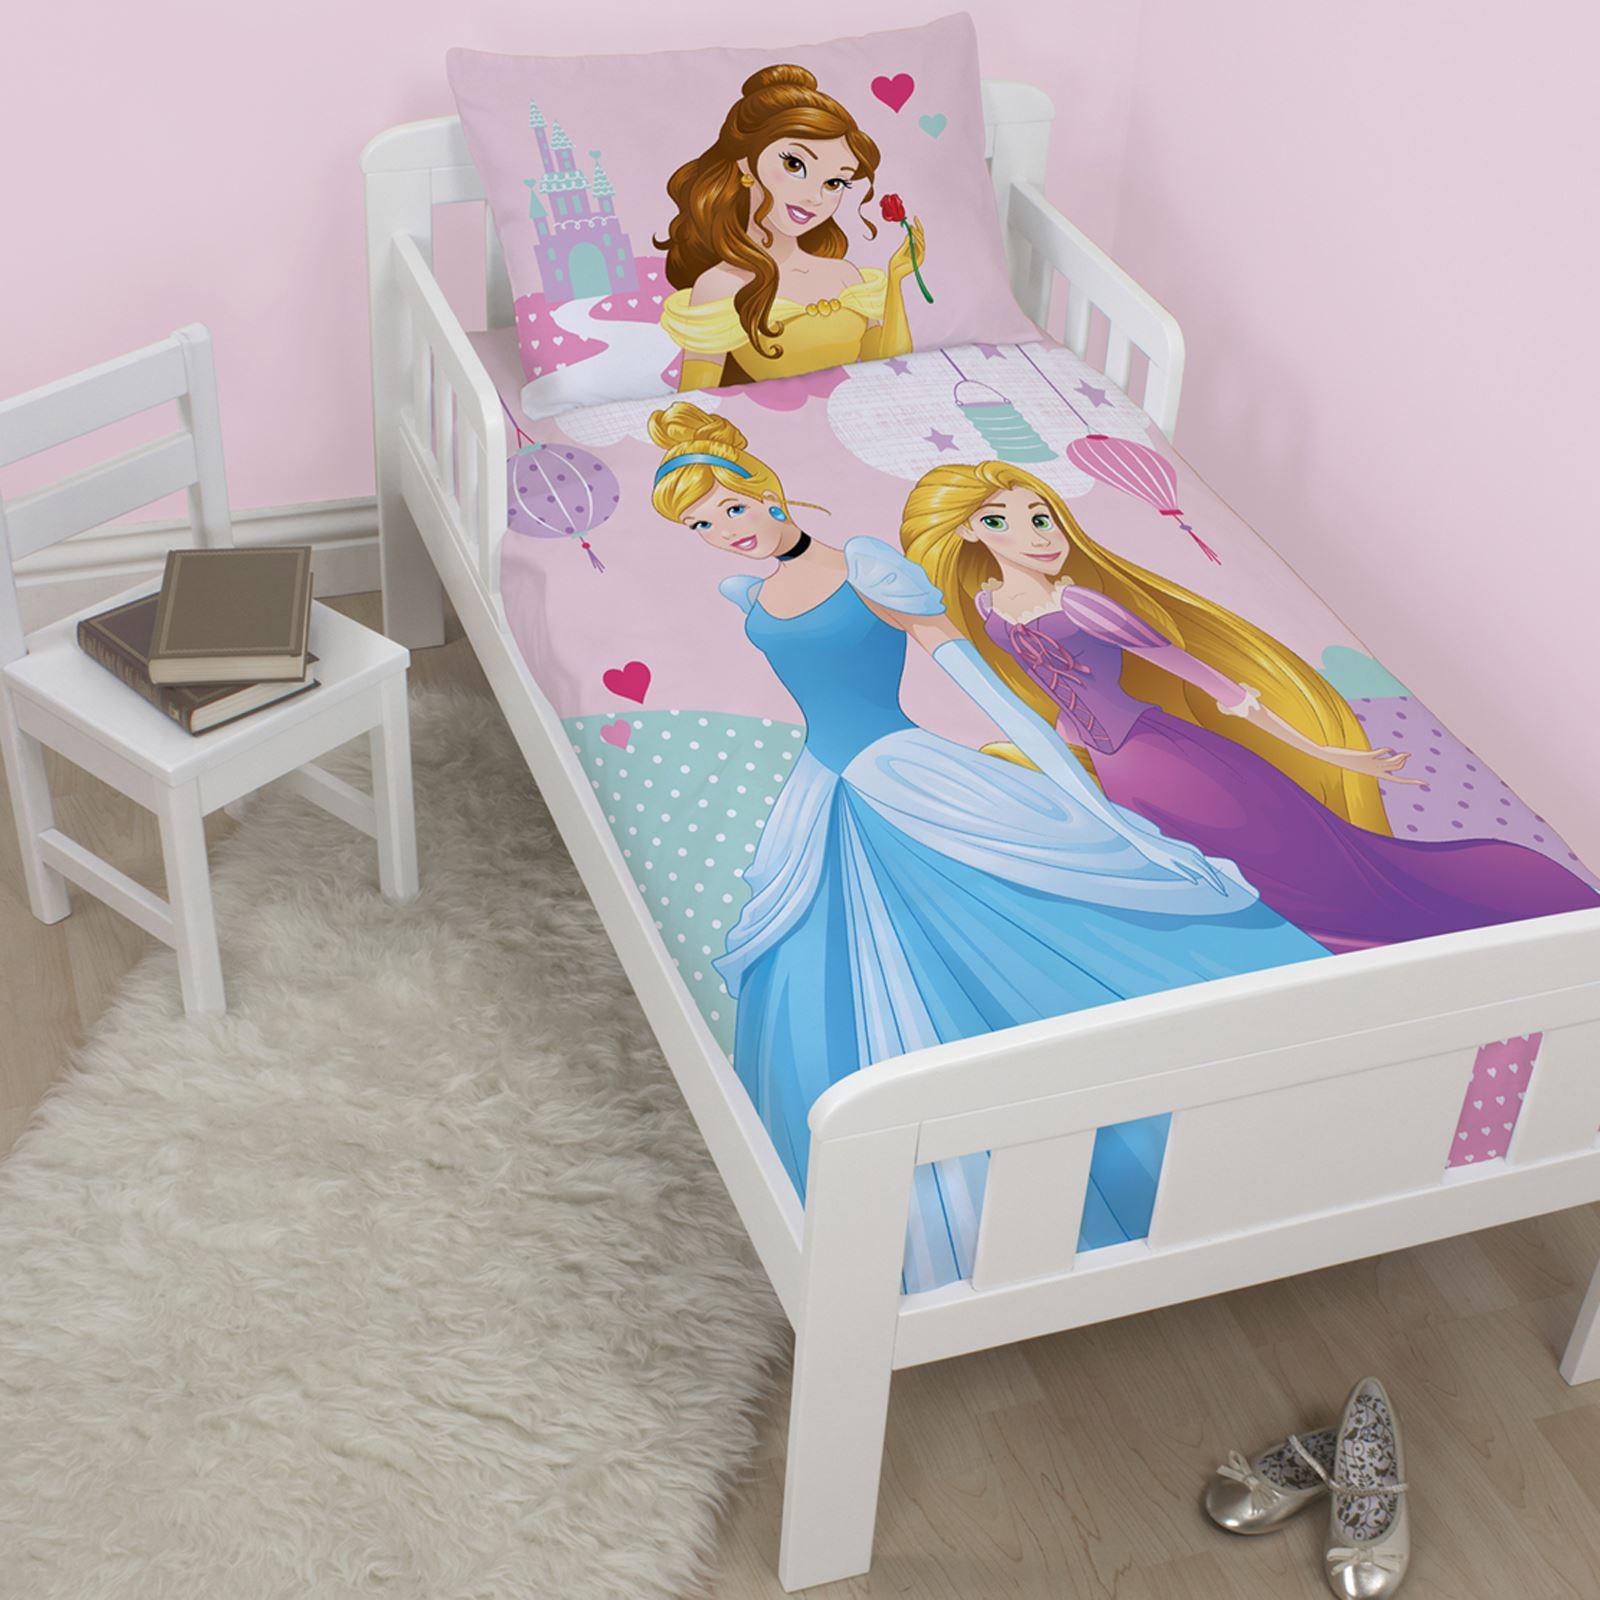 disney cars toddler bedding set uk. character-disney-junior-toddler-bed-duvet-covers-bedding- disney cars toddler bedding set uk n